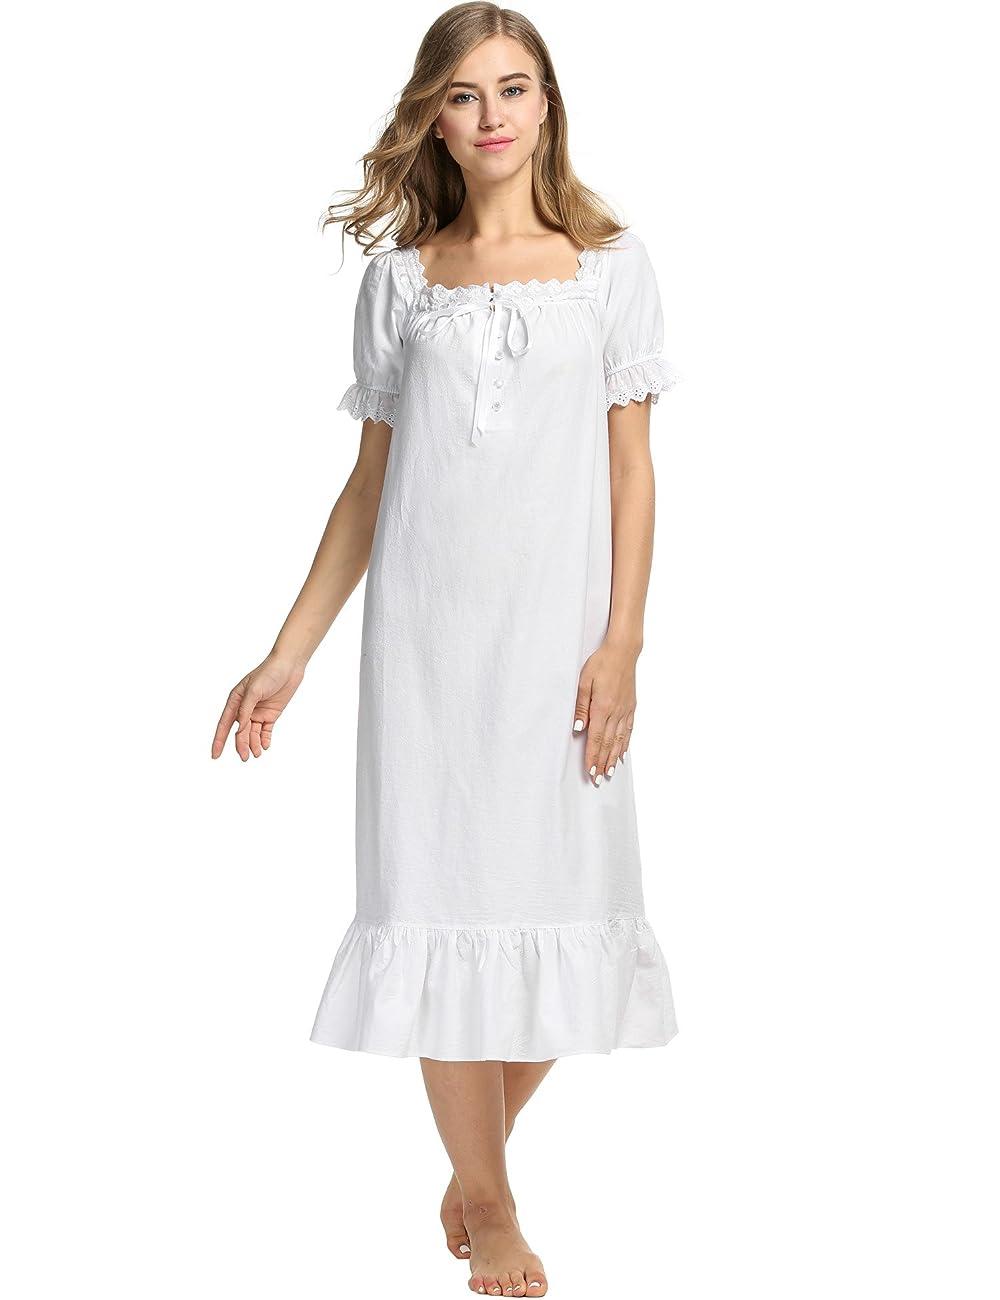 Avidlove Womens Cotton Victorian Vintage Short Sleeve Nightgown Sleepwear 1